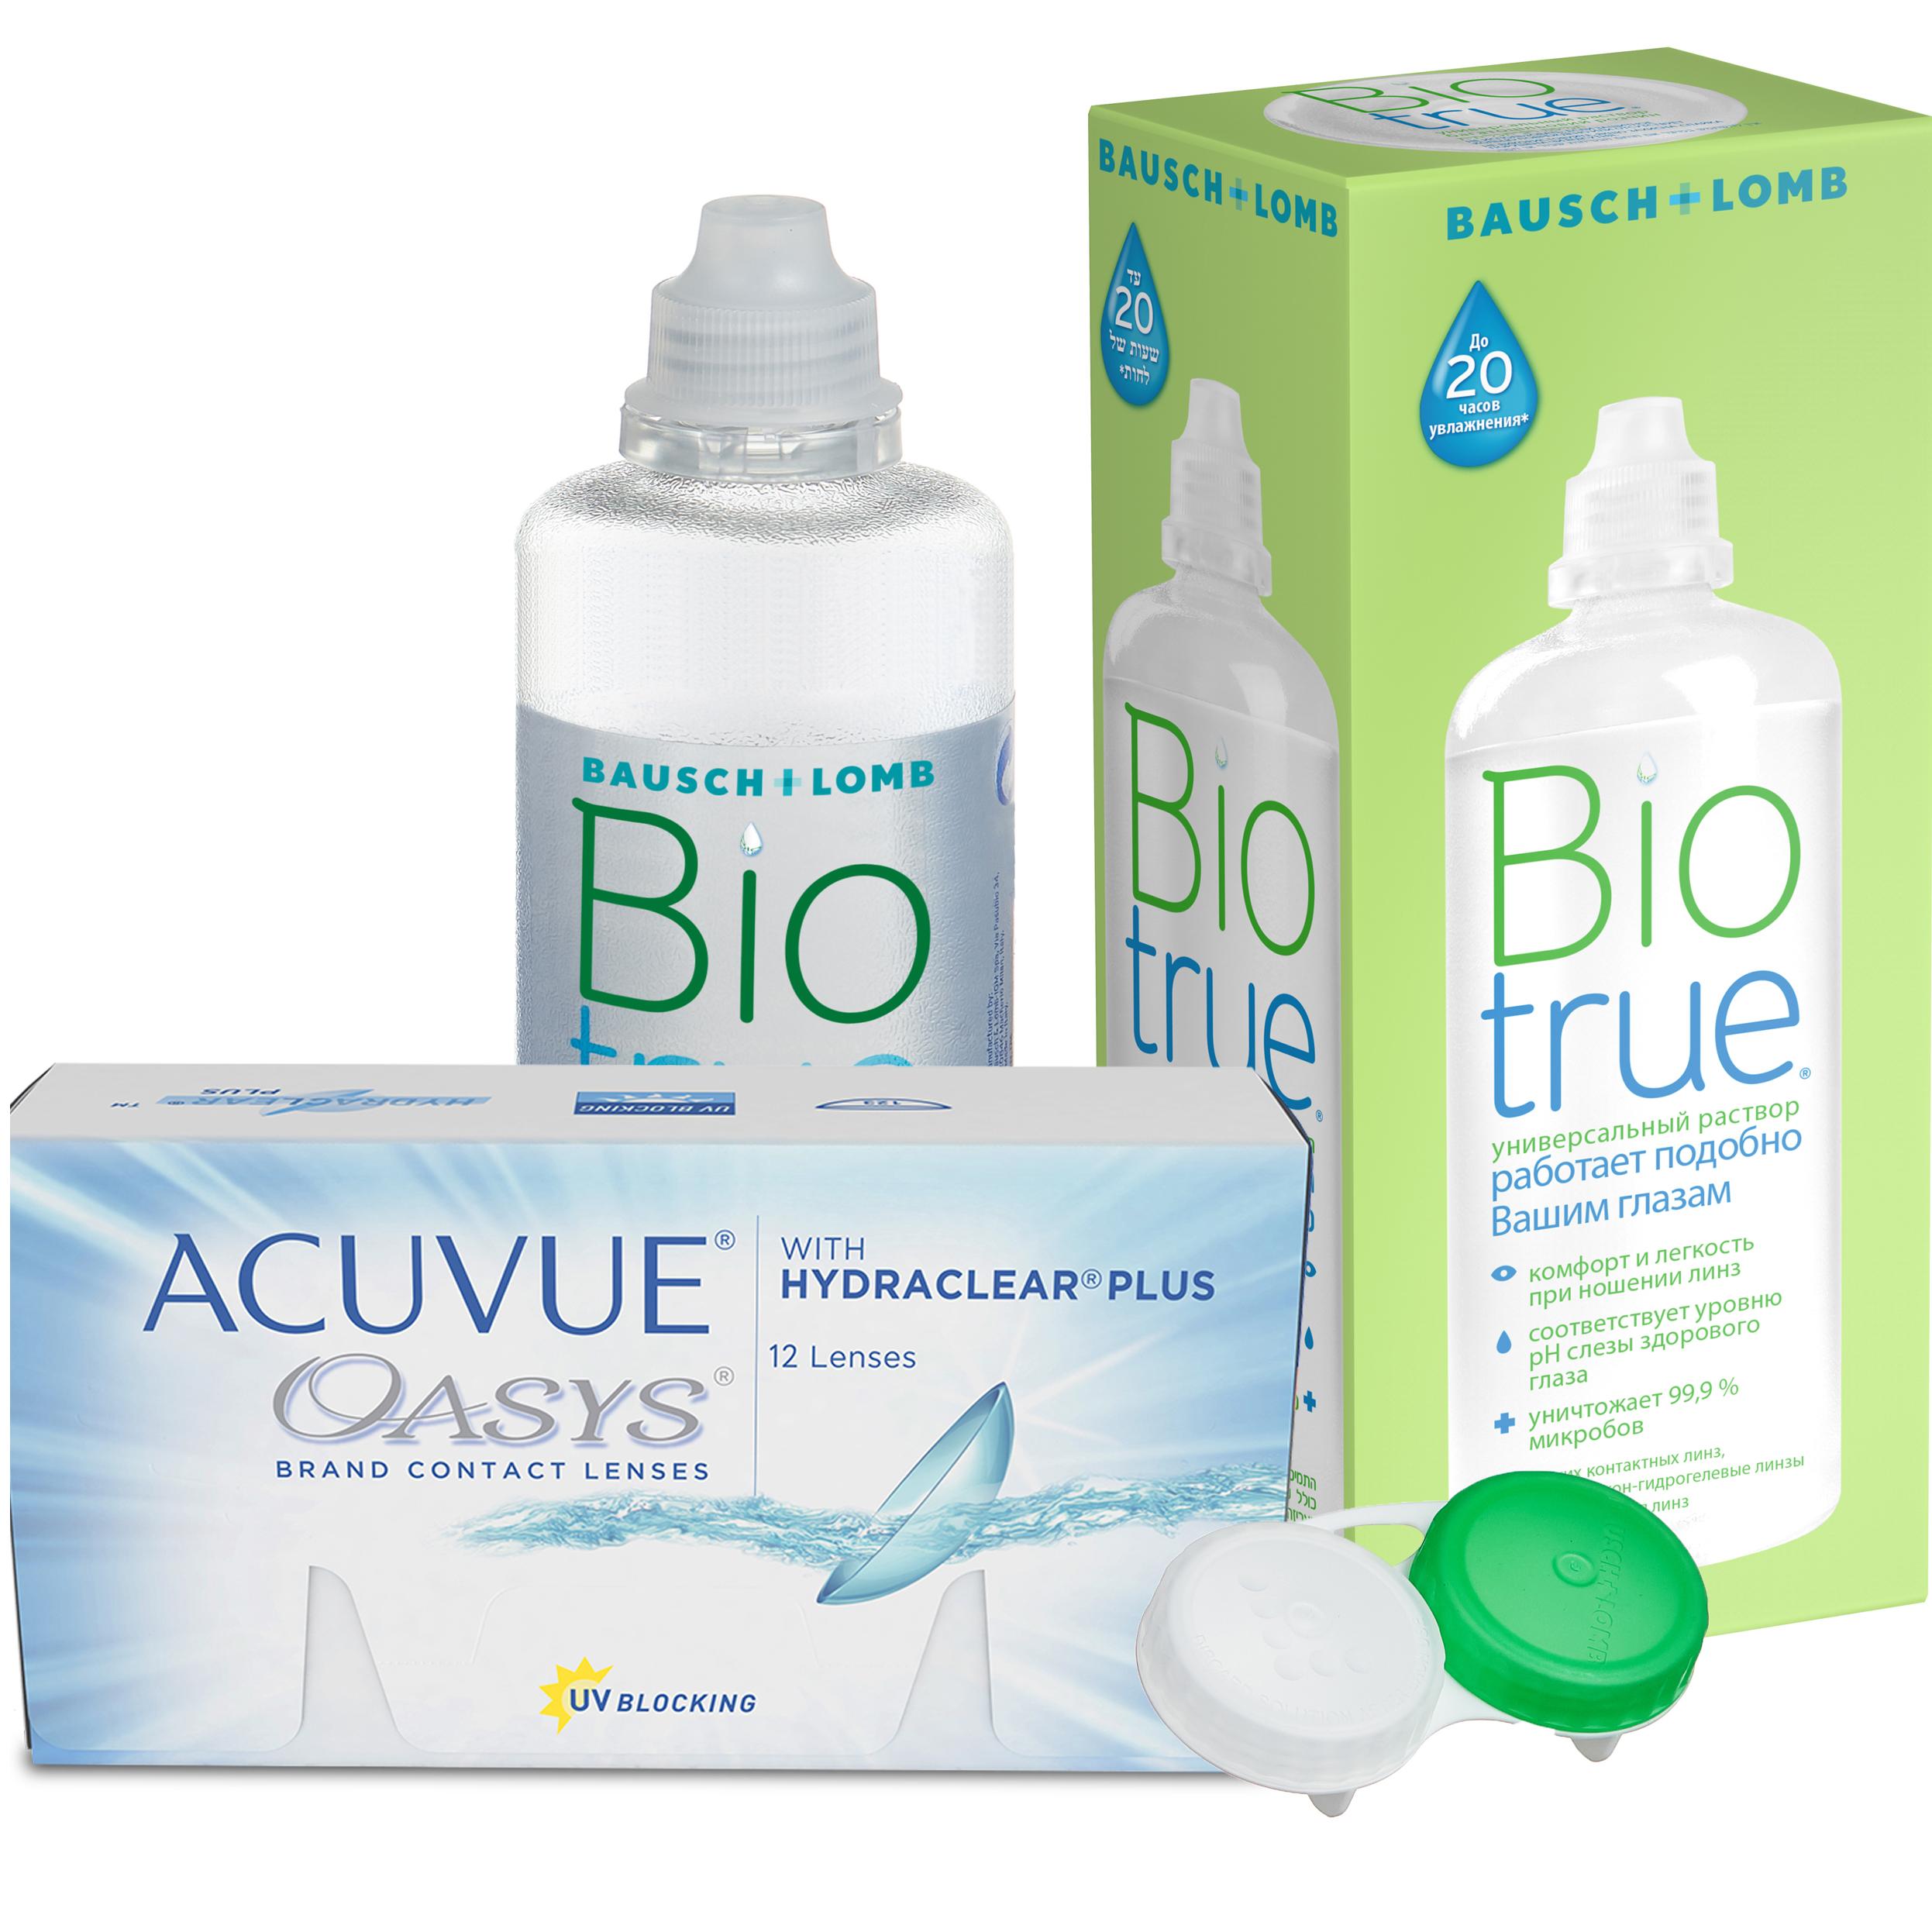 Купить Oasys with Hydraclear Plus 12 линз + Biotrue, Контактные линзы Acuvue Oasys with Hydraclear Plus 12 линз R 8.4 -6, 00 + Biotrue 300 мл